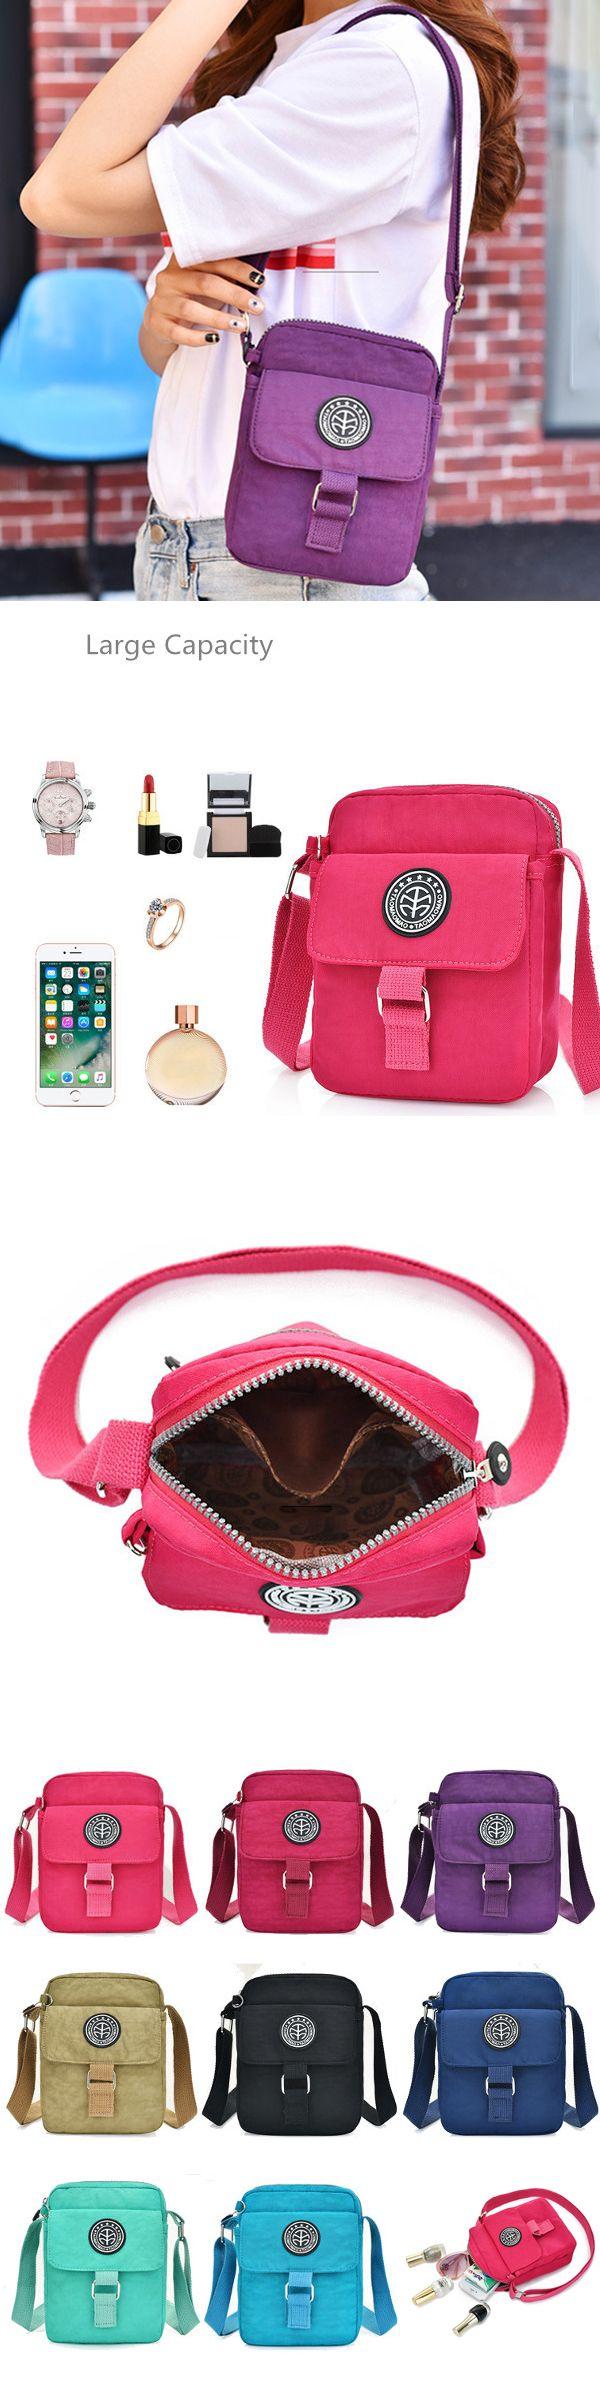 Women Nylon Colorful Messenger Bags Casual Shoulder Bags Outdoor Waterproof Crossbody Bags